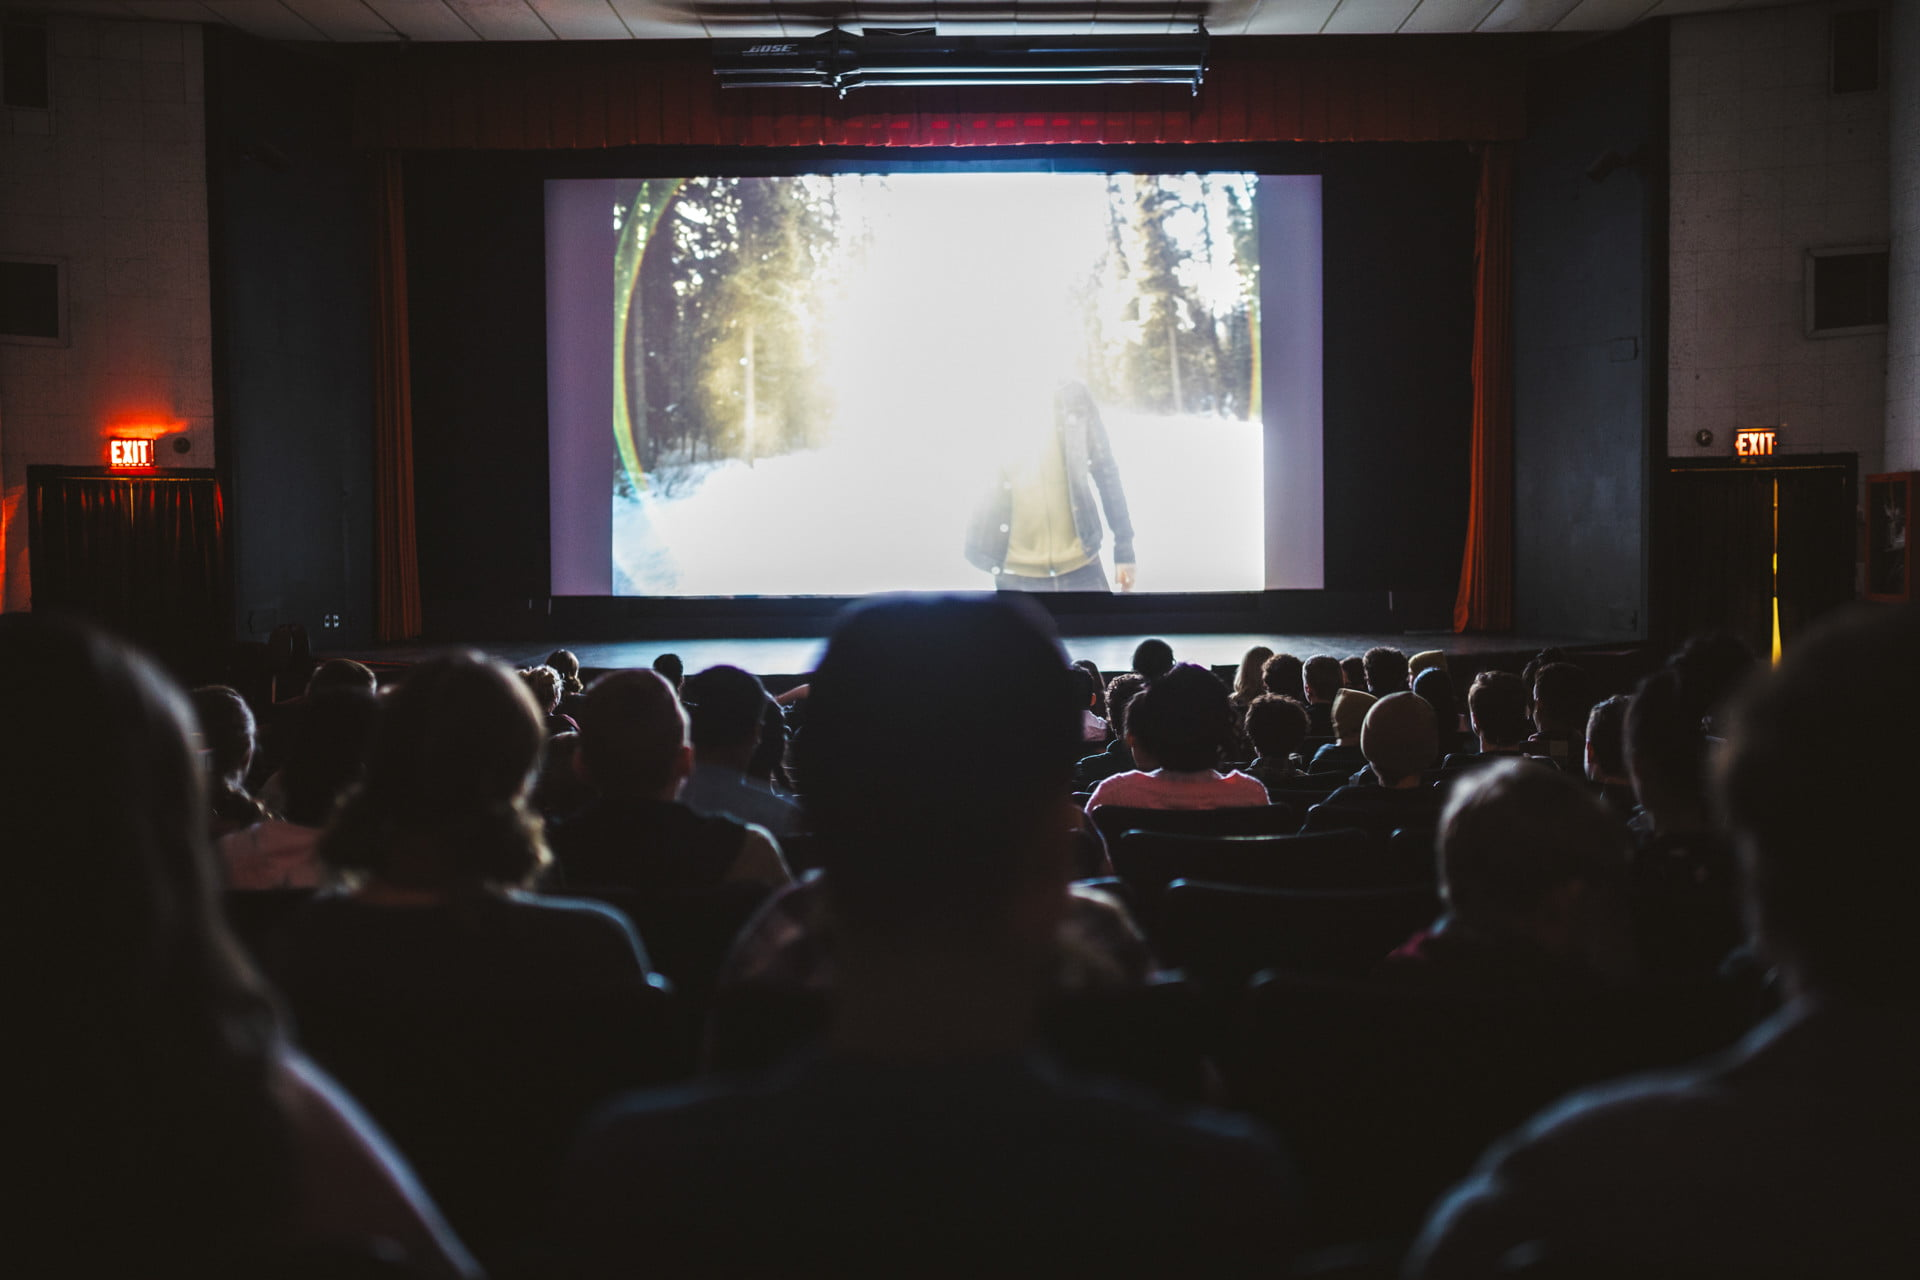 MoviePass vs. AMC Stubs A-List vs. Regal Unlimited vs. Cinemark Movie Club